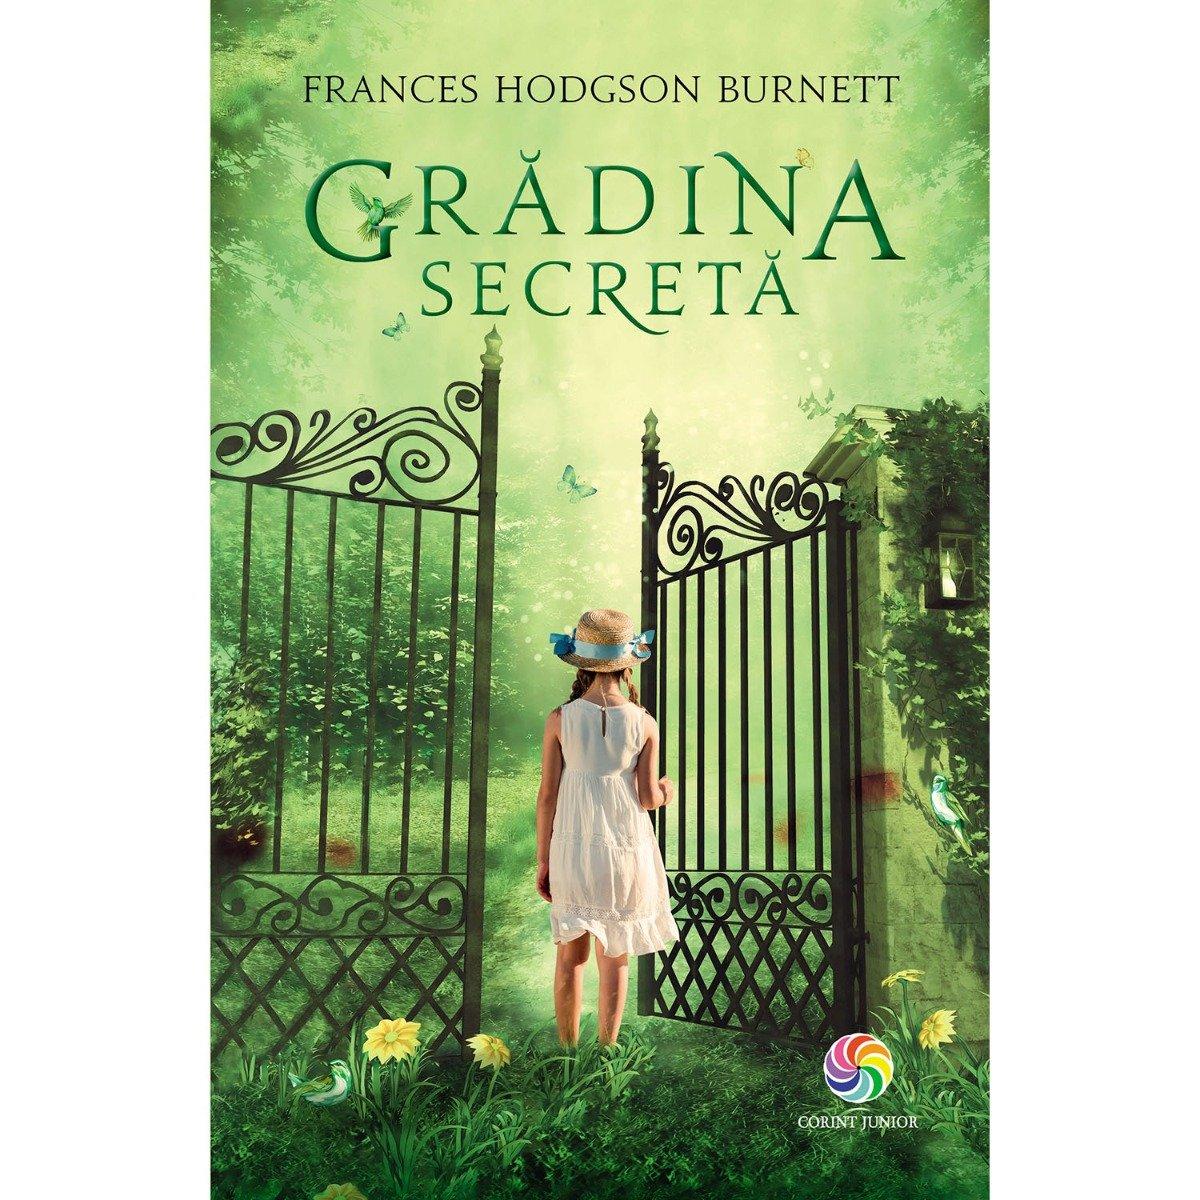 Carte Editura Corint, Gradina secreta, Frances Hodgson Burnett